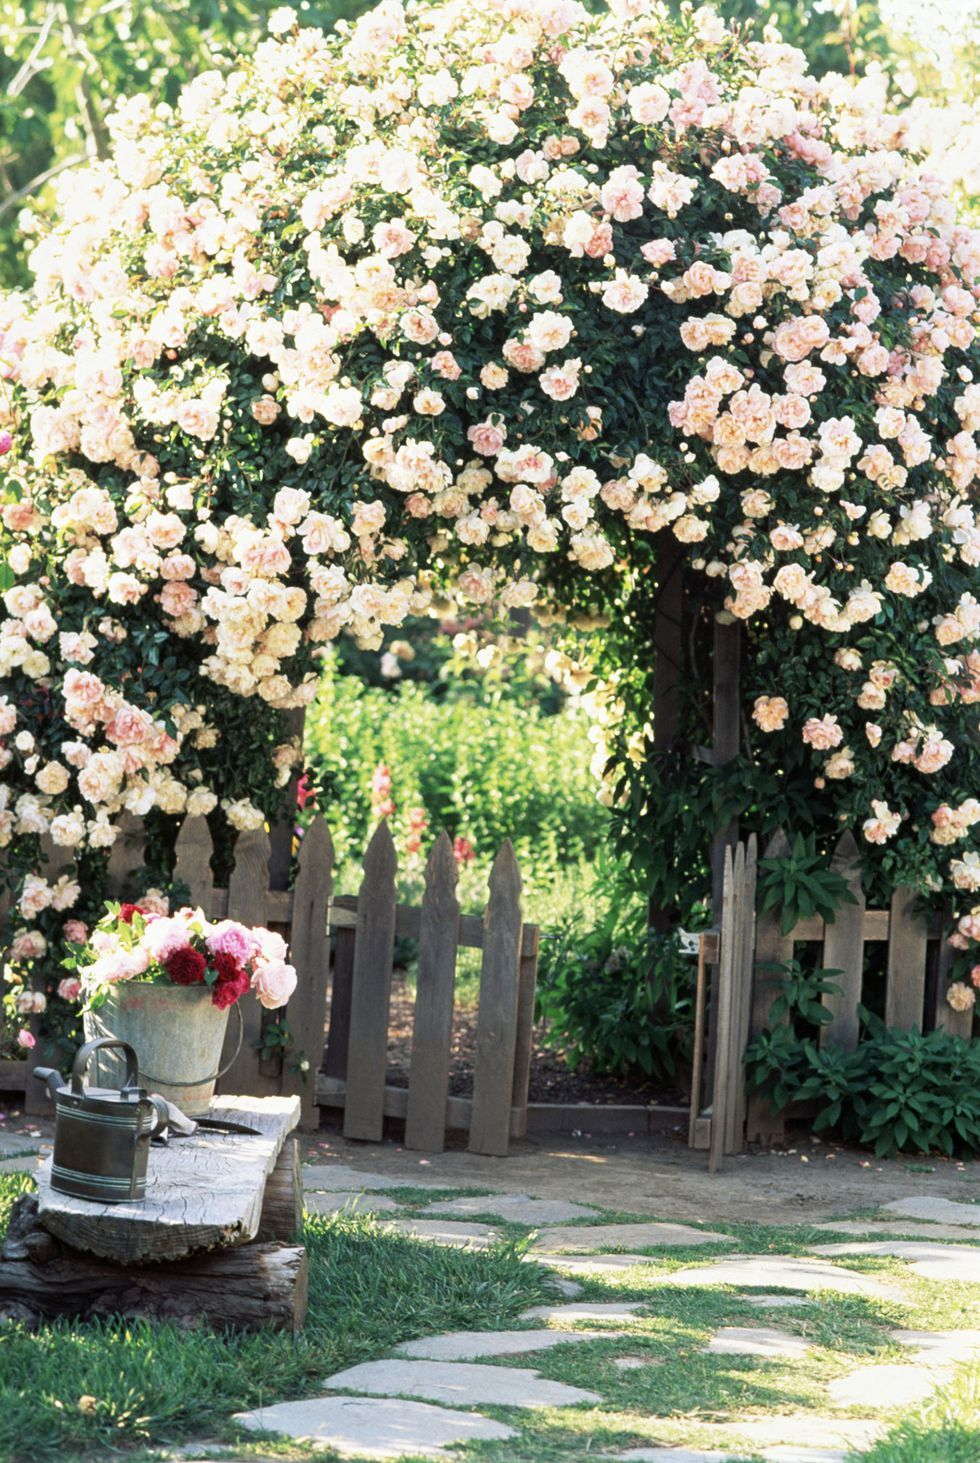 9 Lovely Ways to Make a Cottage-Style Garden | Beet | Pinterest ...